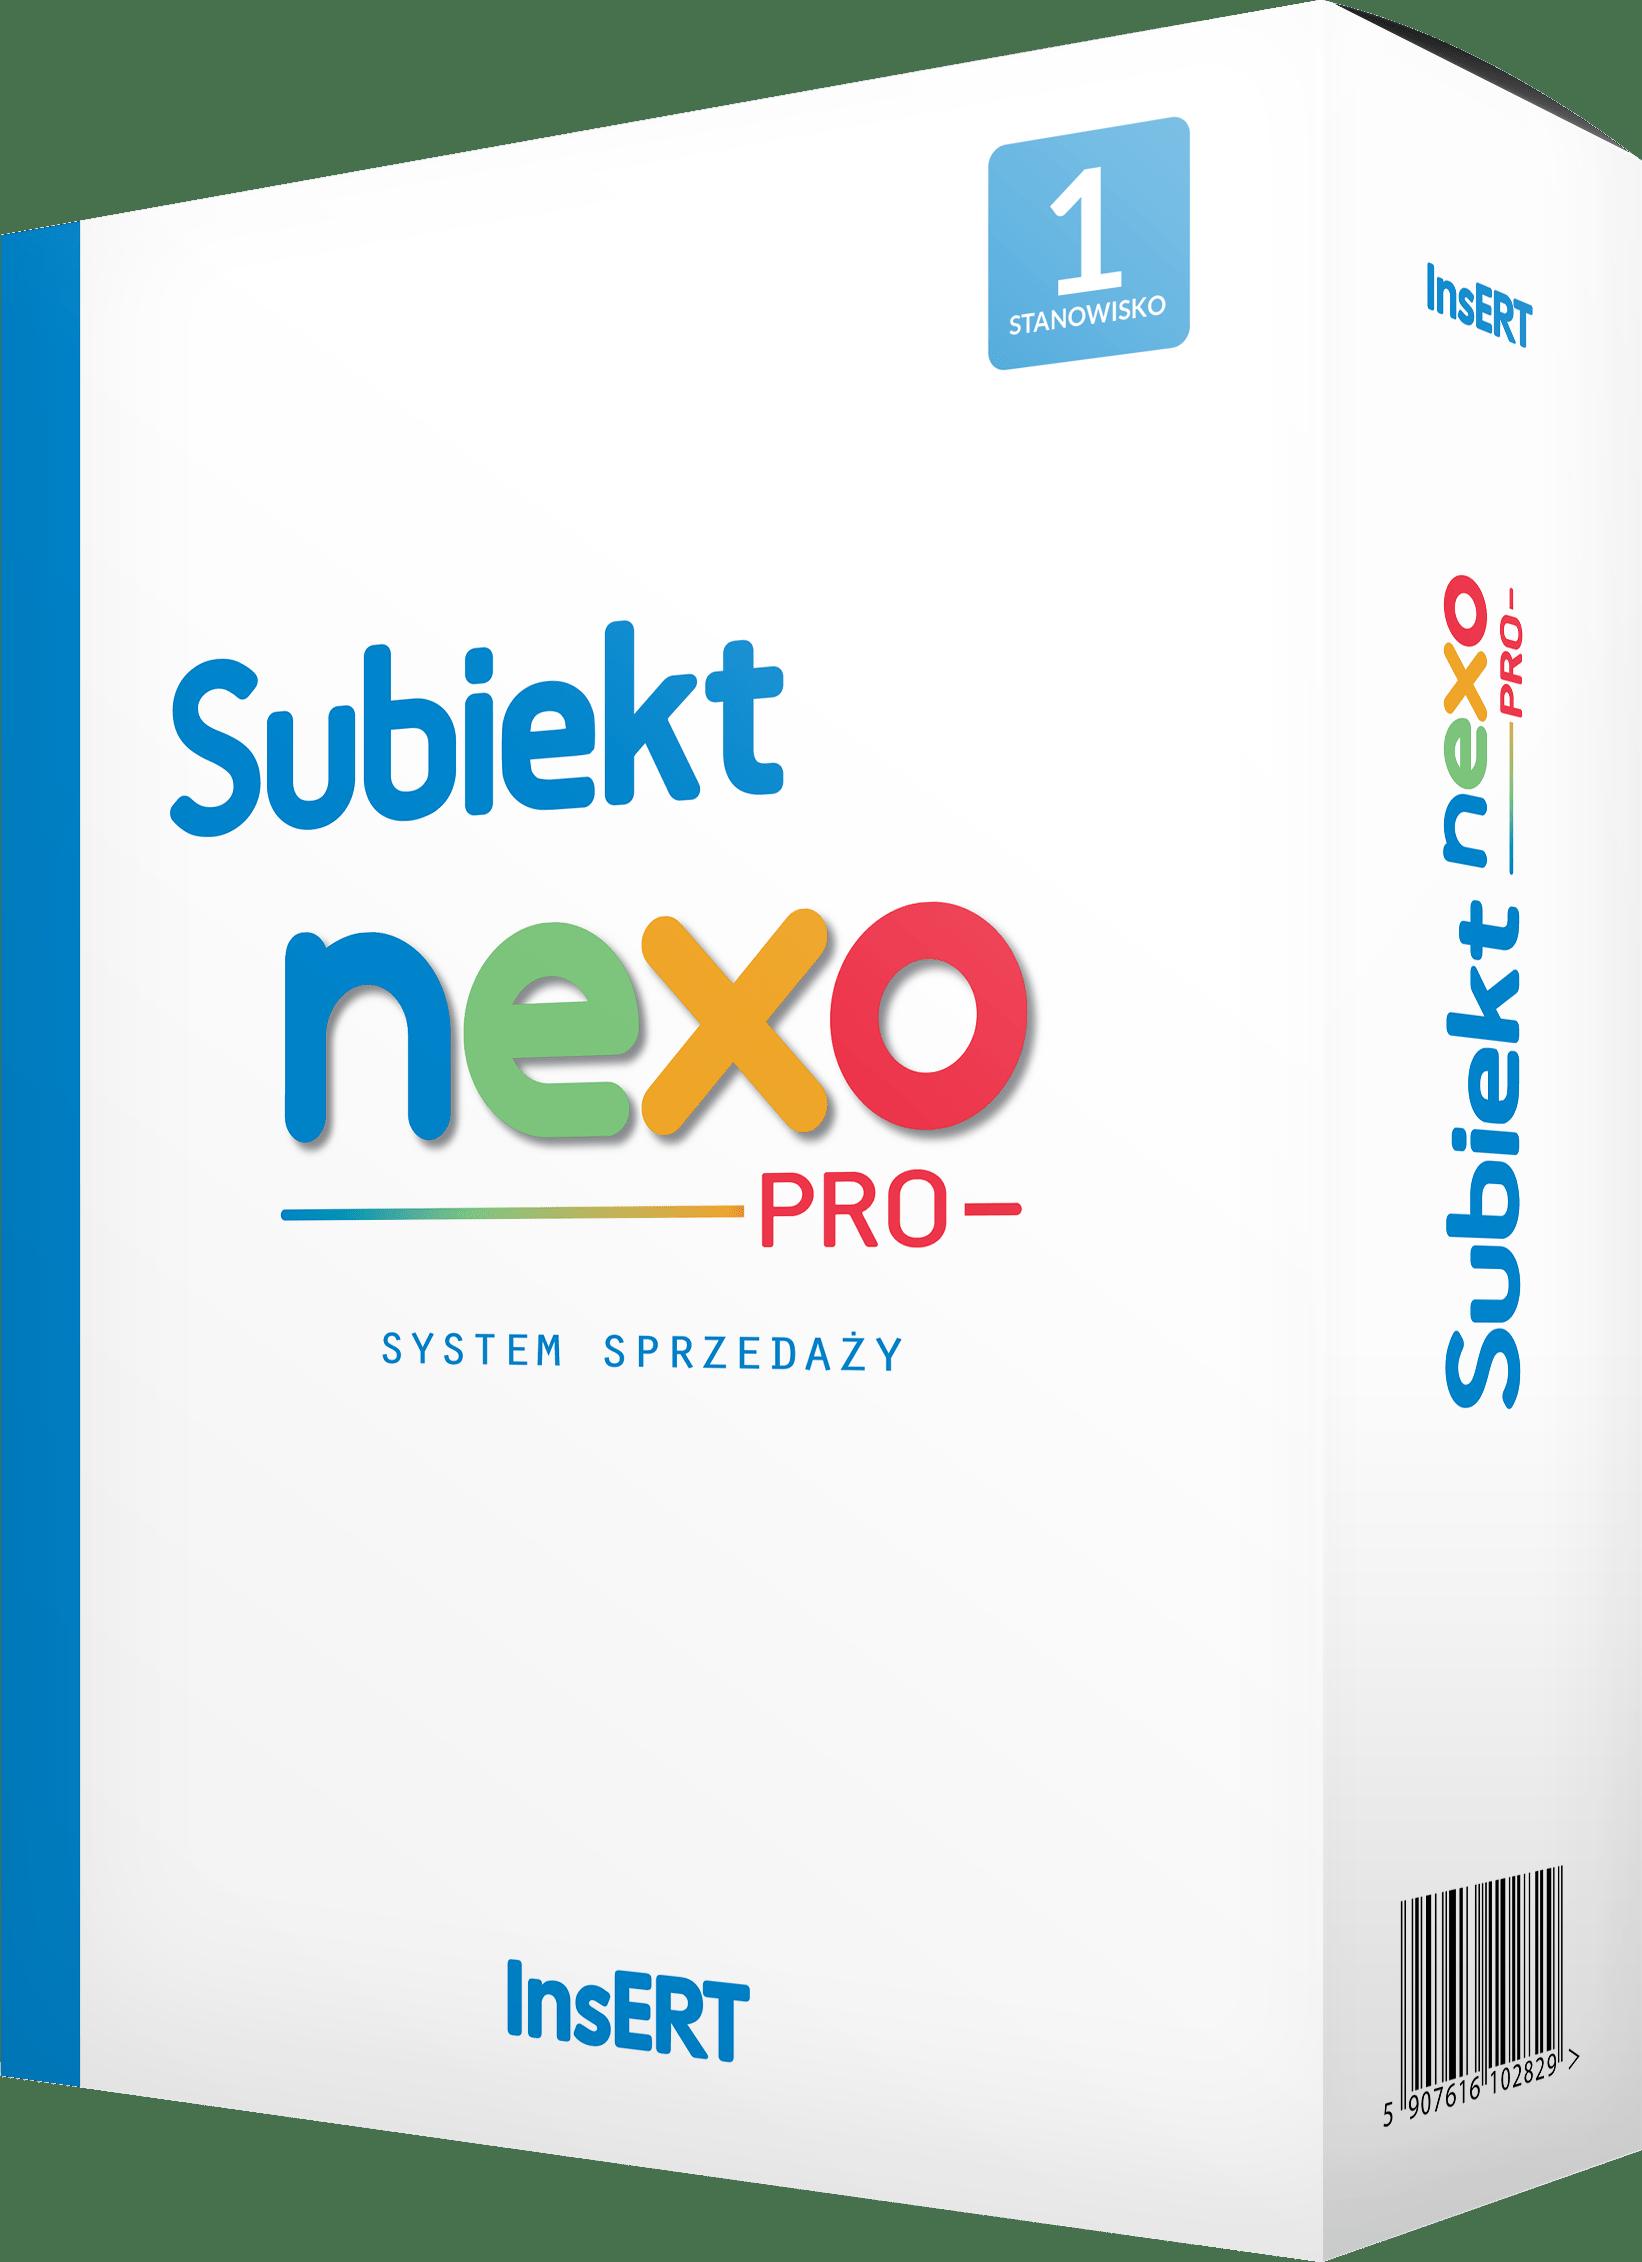 Subiekt_nexo_PRO_1_stanowisko_pudelko_dsgsoftware